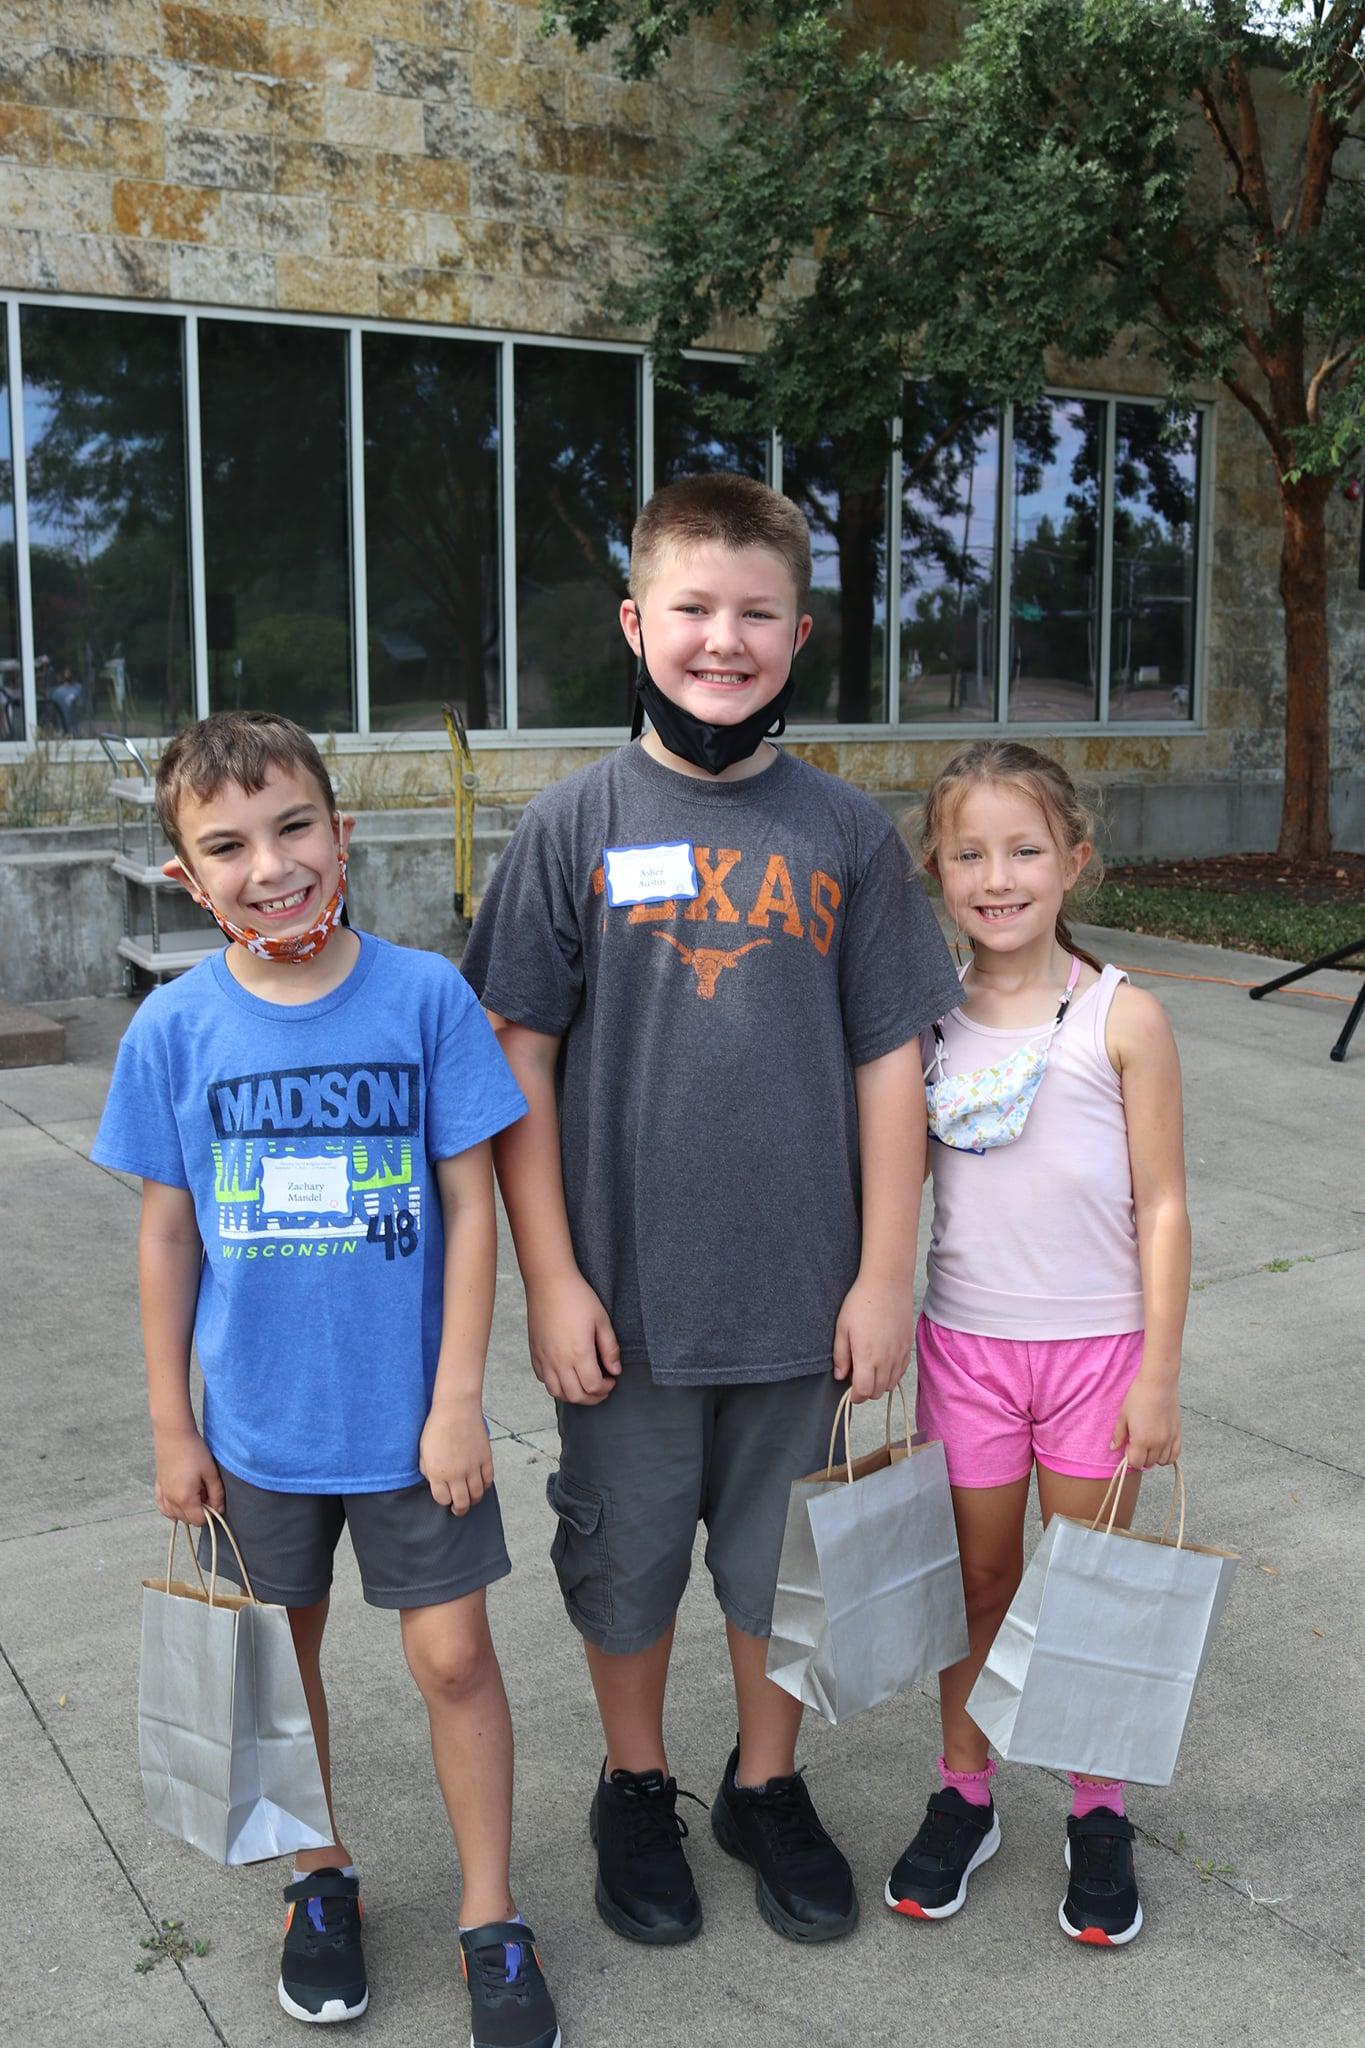 RS 9 19 children smiling